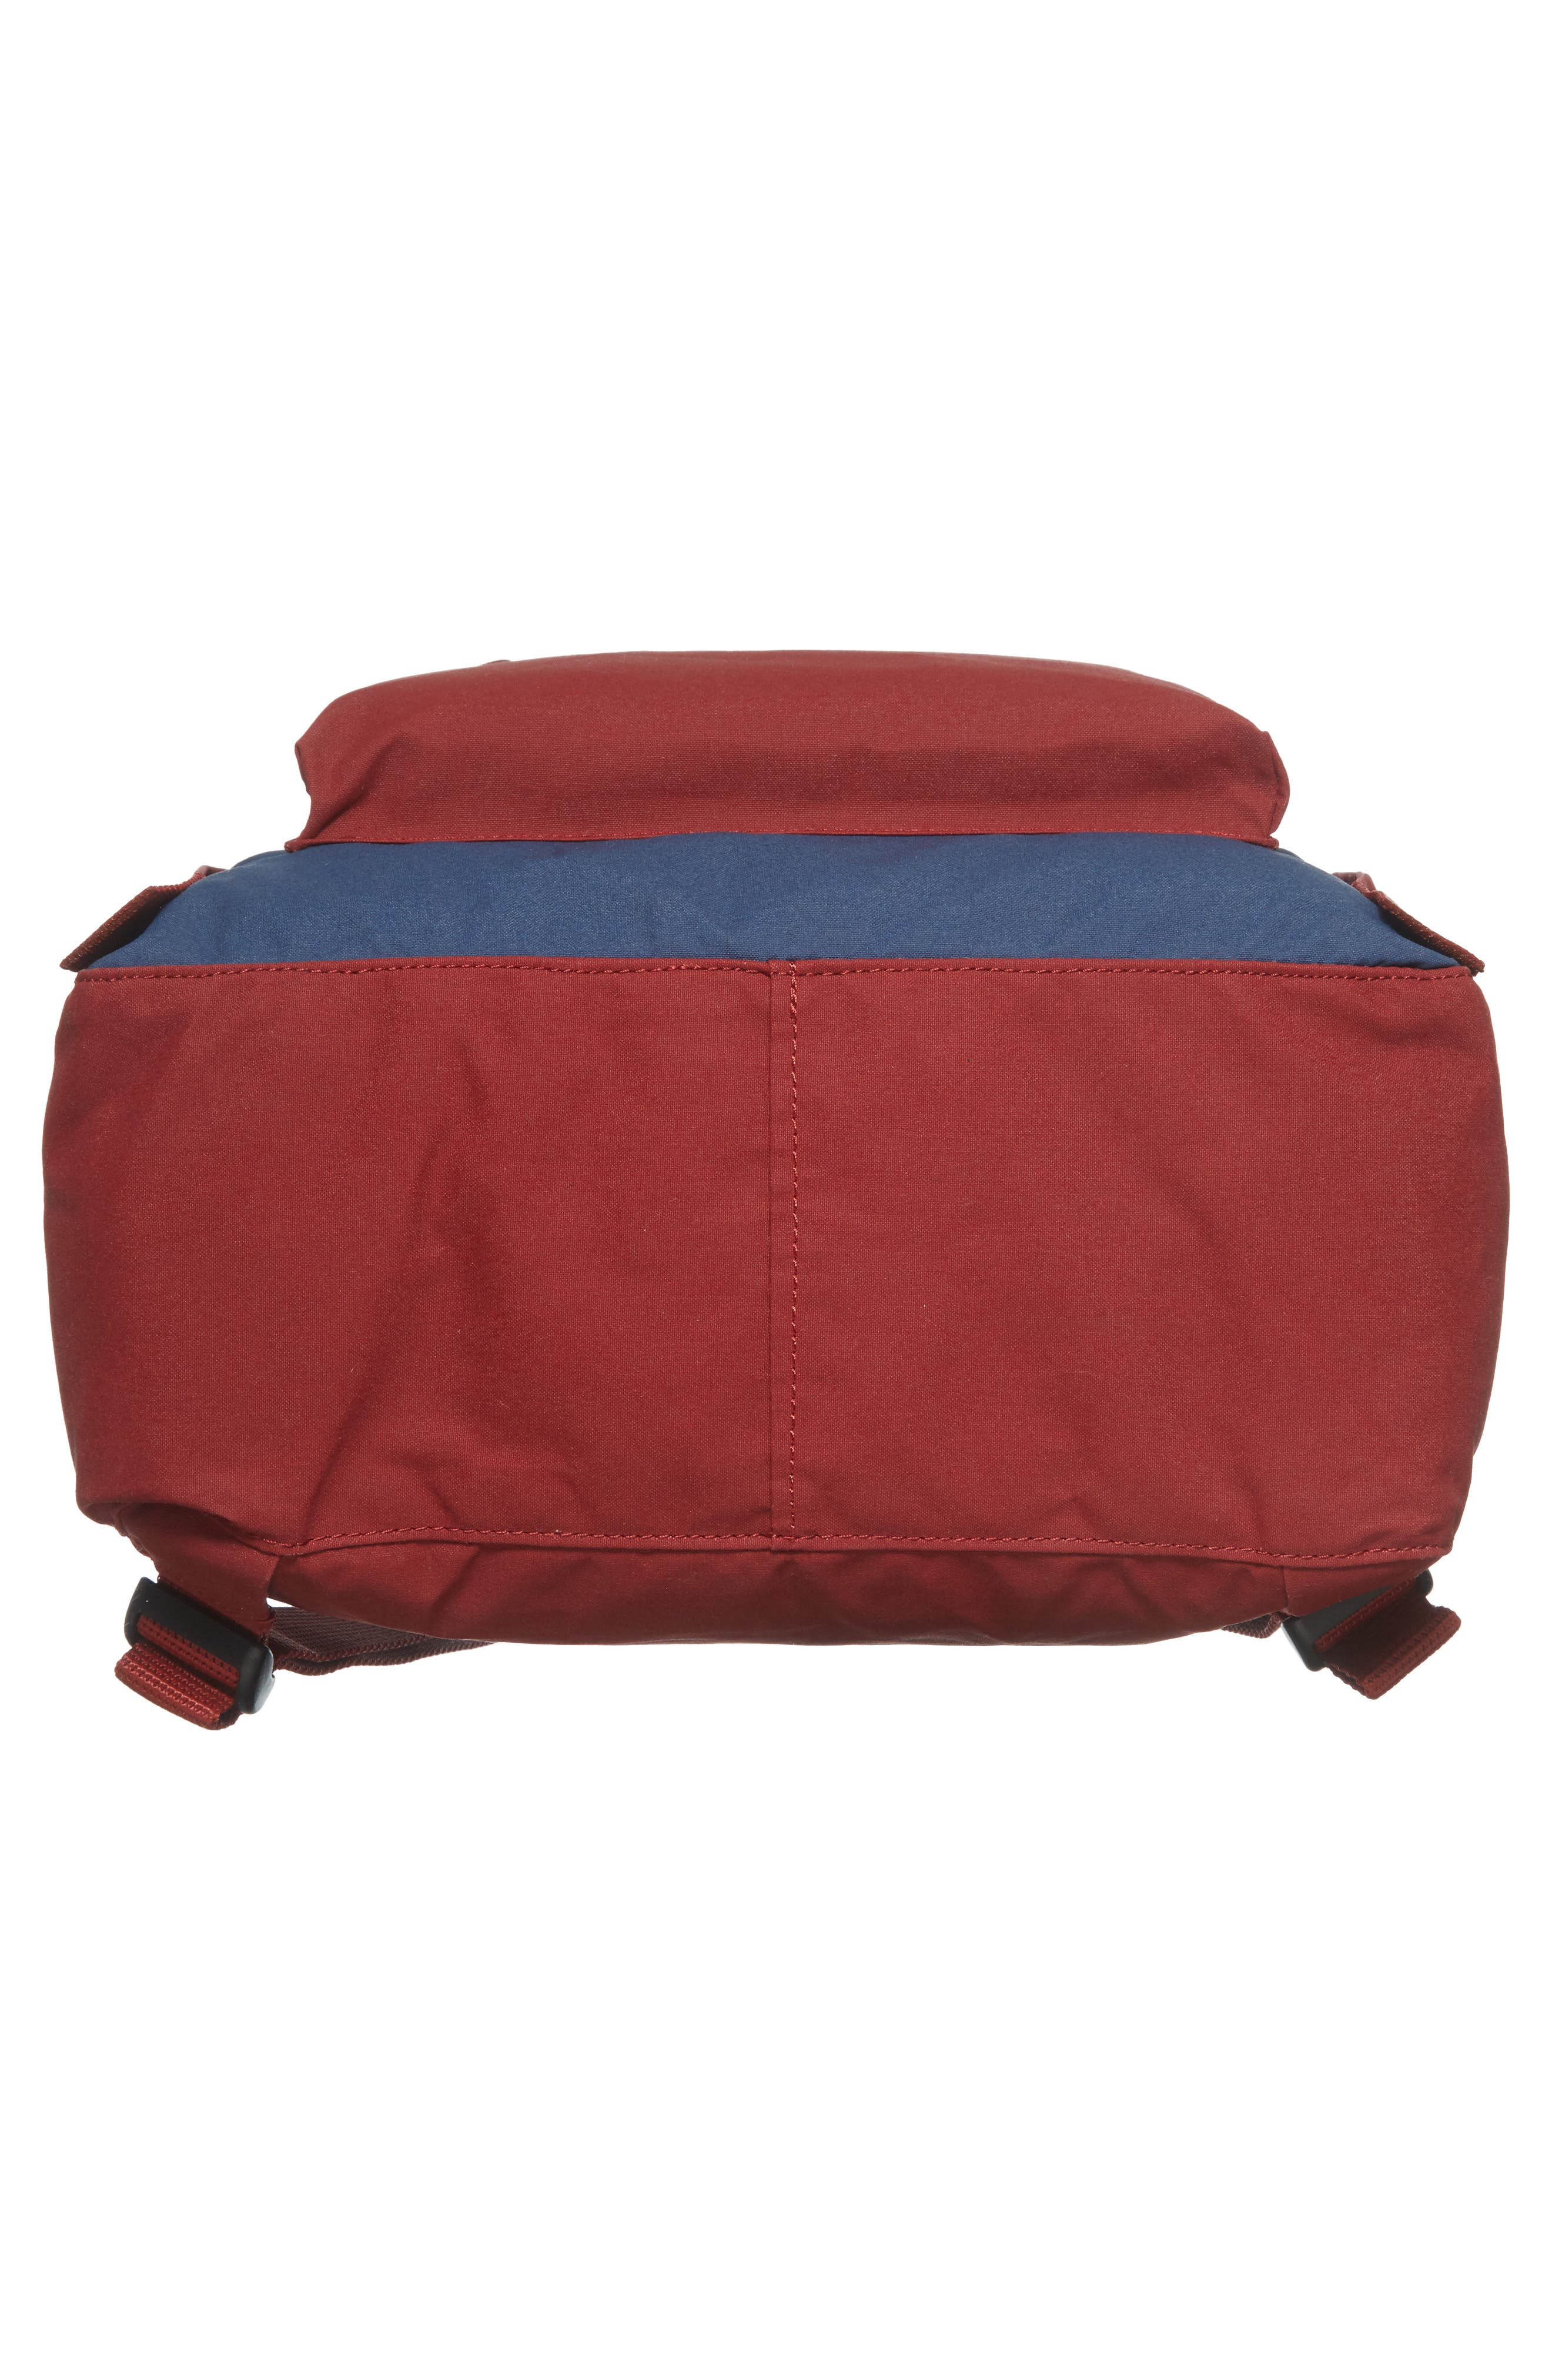 'Kånken' Water Resistant Backpack,                             Alternate thumbnail 336, color,